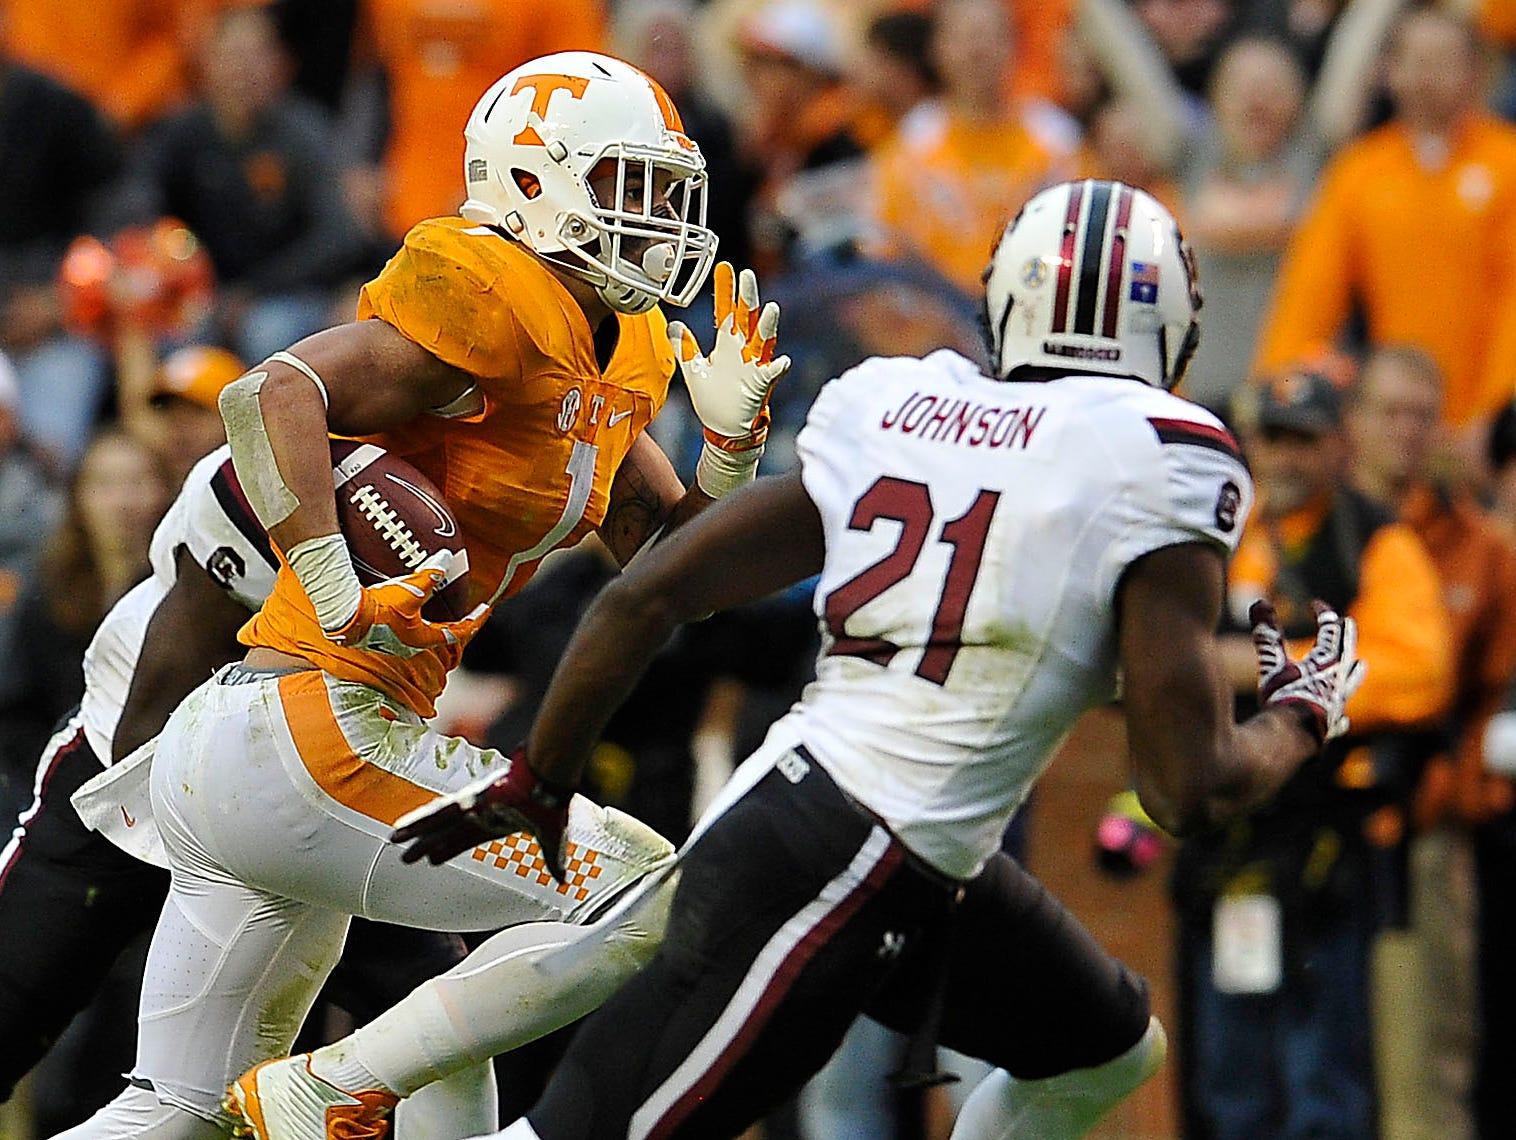 Tennessee running back Jalen Hurd (1) picks up yardage against South Carolina on Nov. 7, 2015.